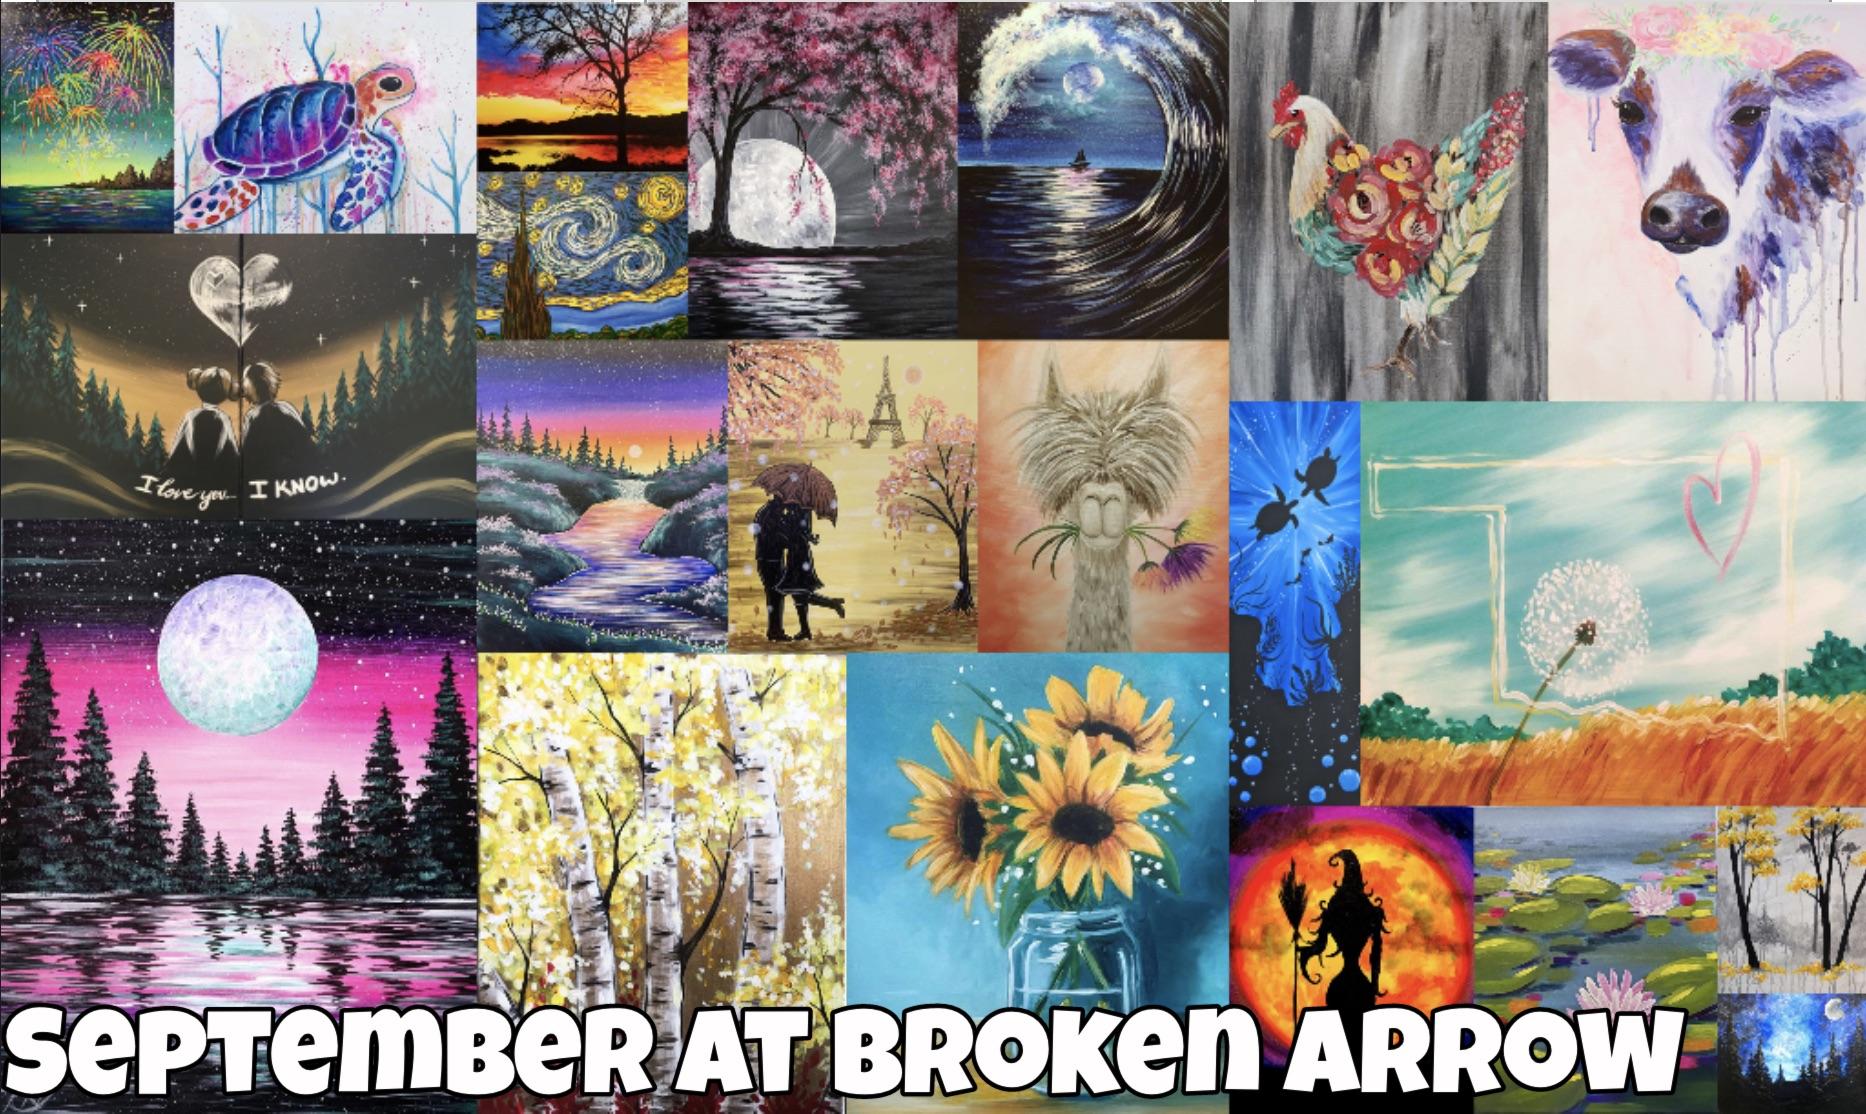 Broken Arrow's September Calendar